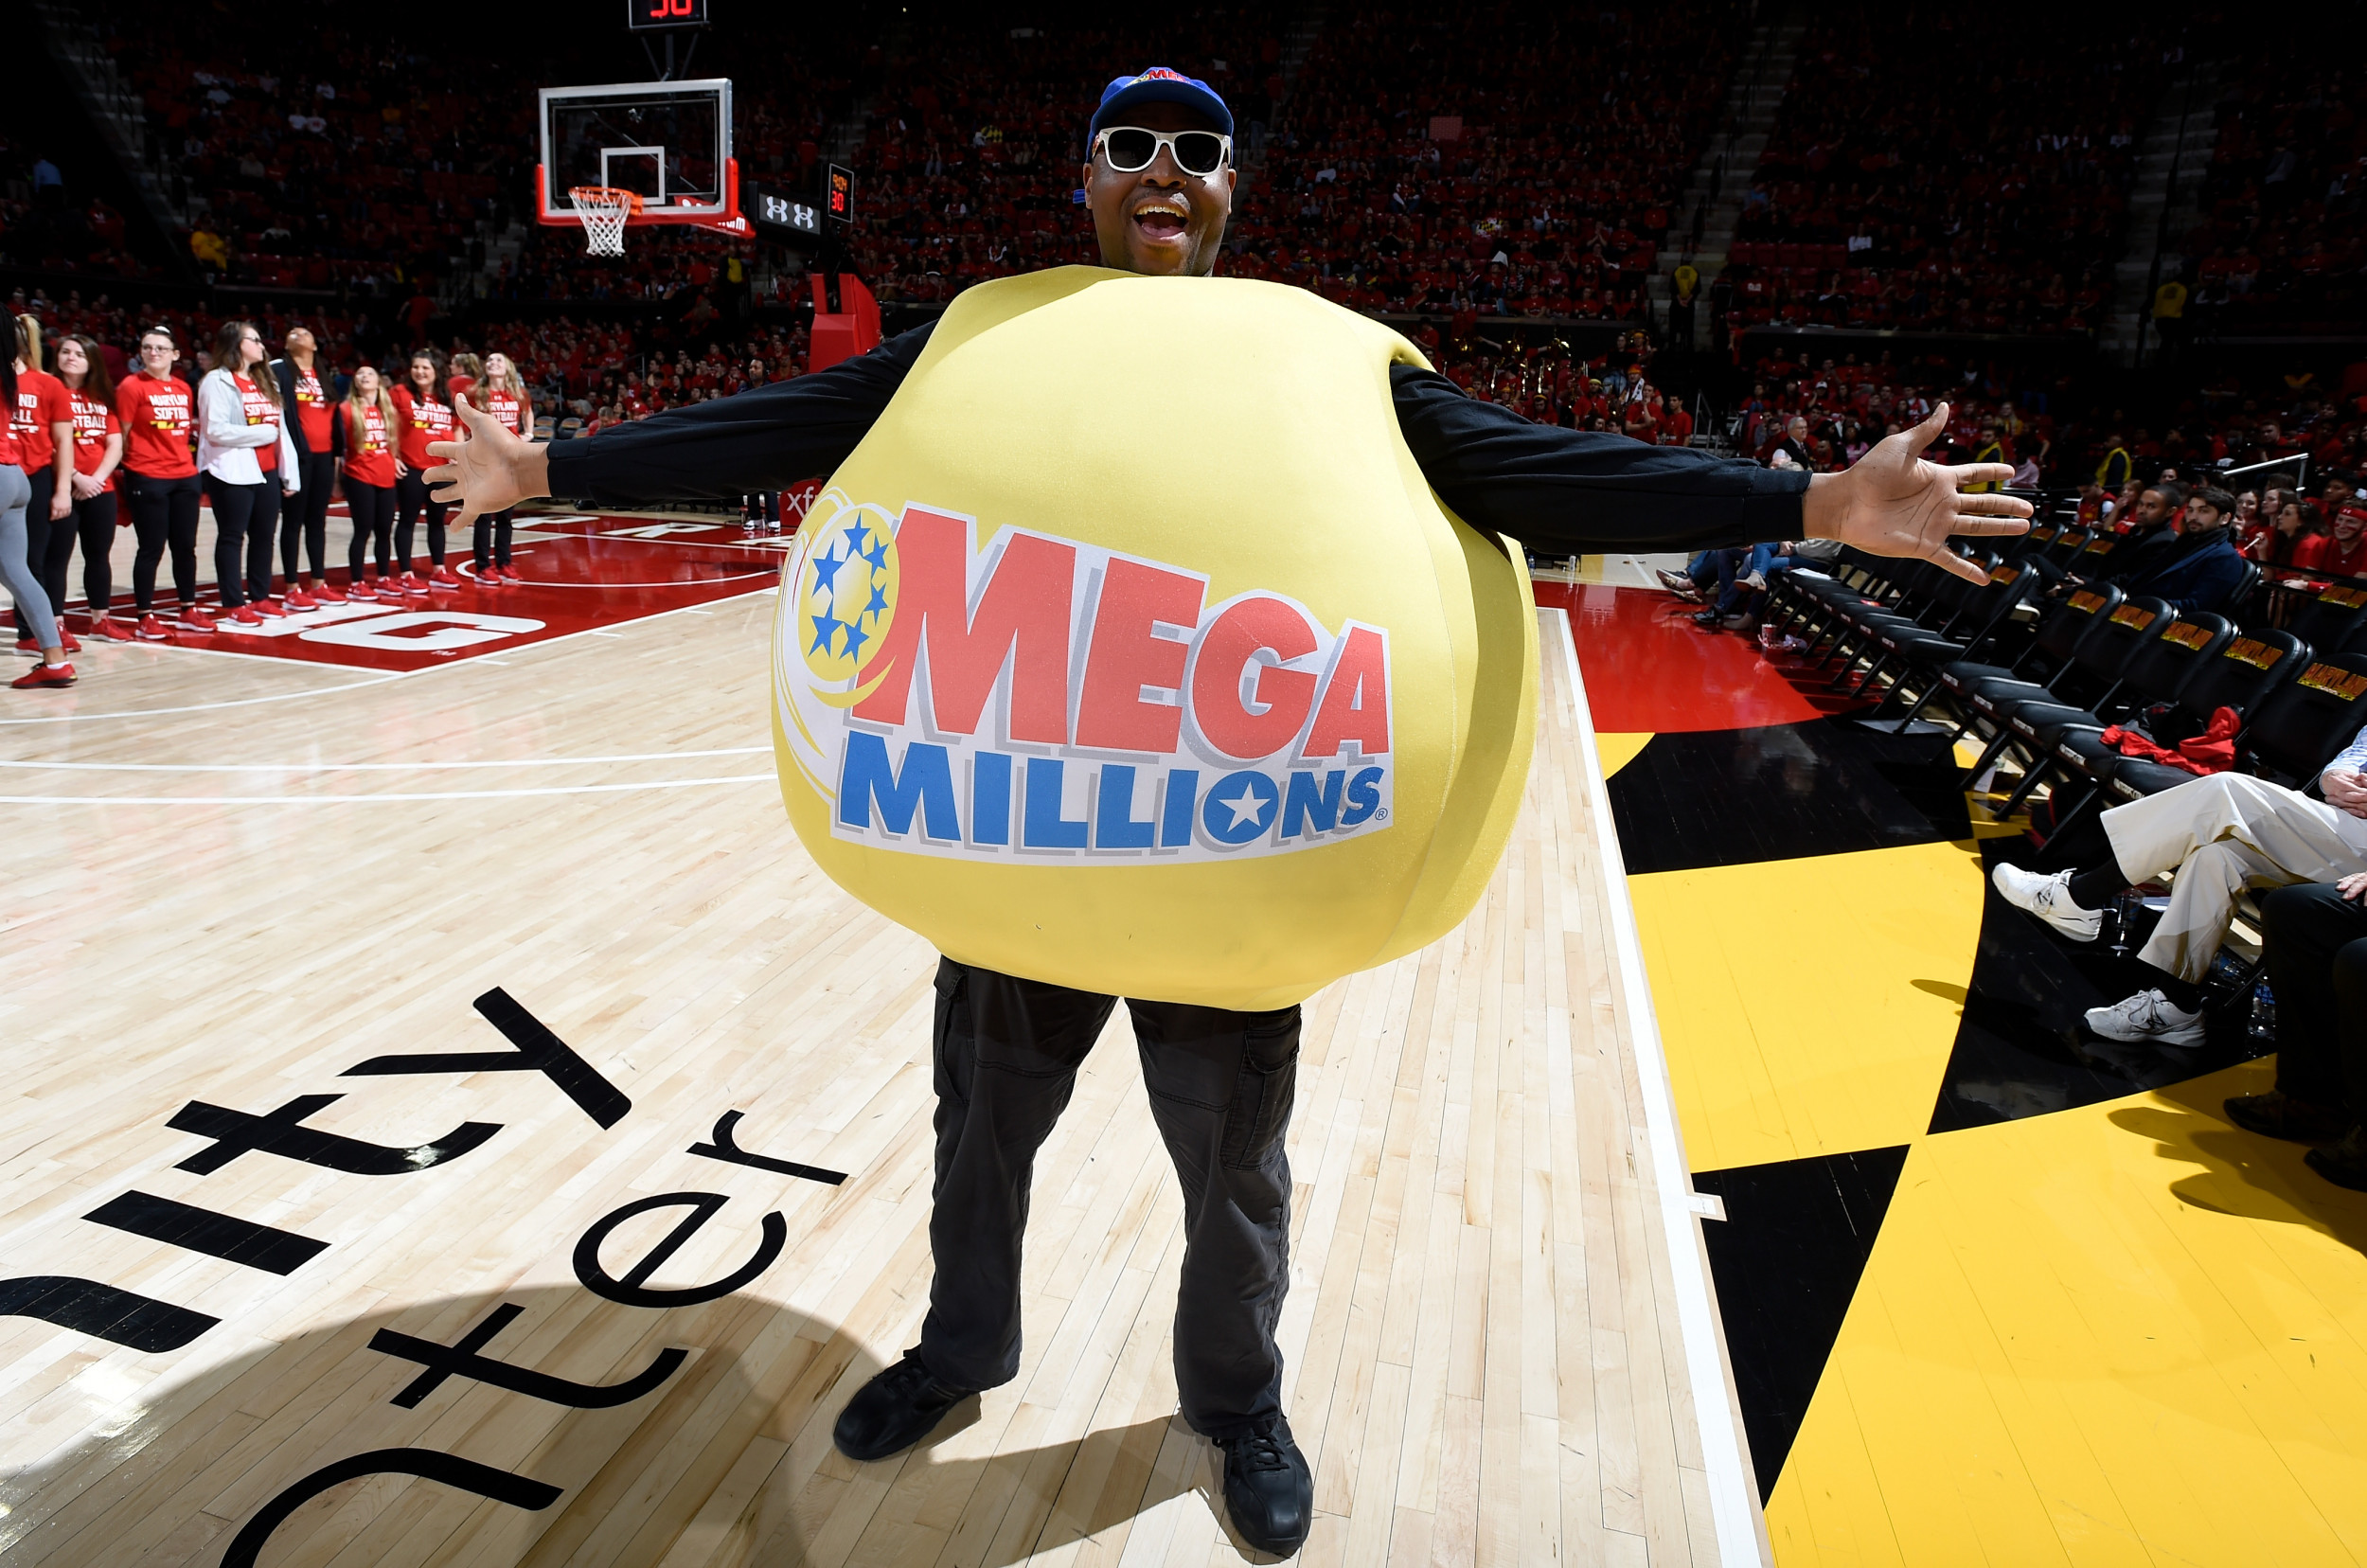 Getty Images Mega Millions Mascot